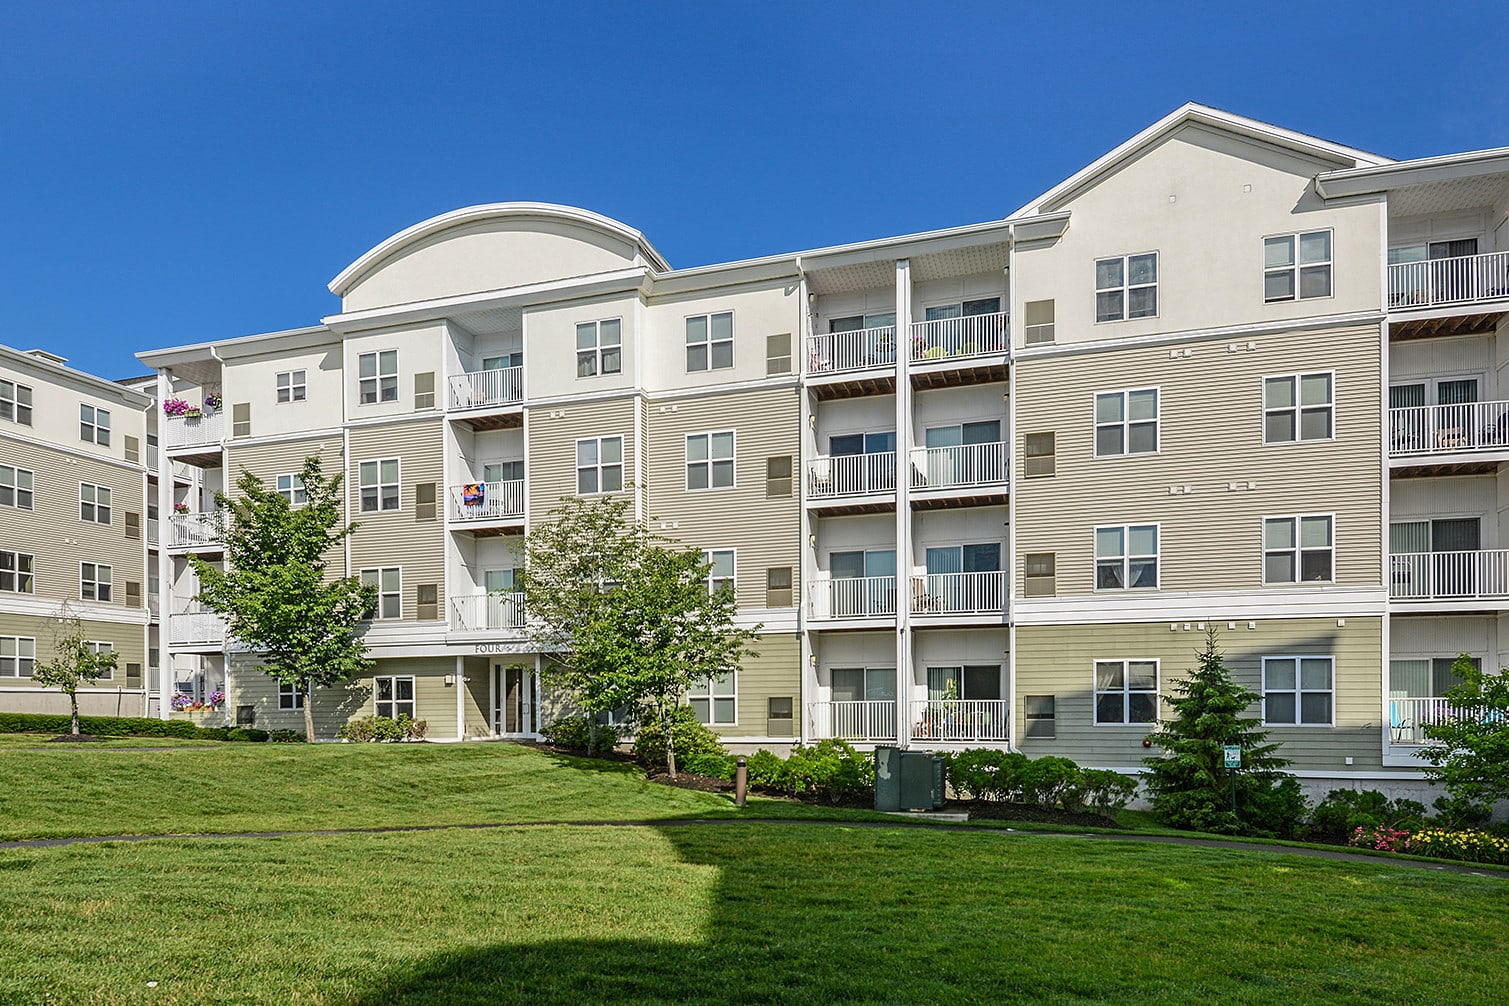 Endicott Green, Danvers MA apartments